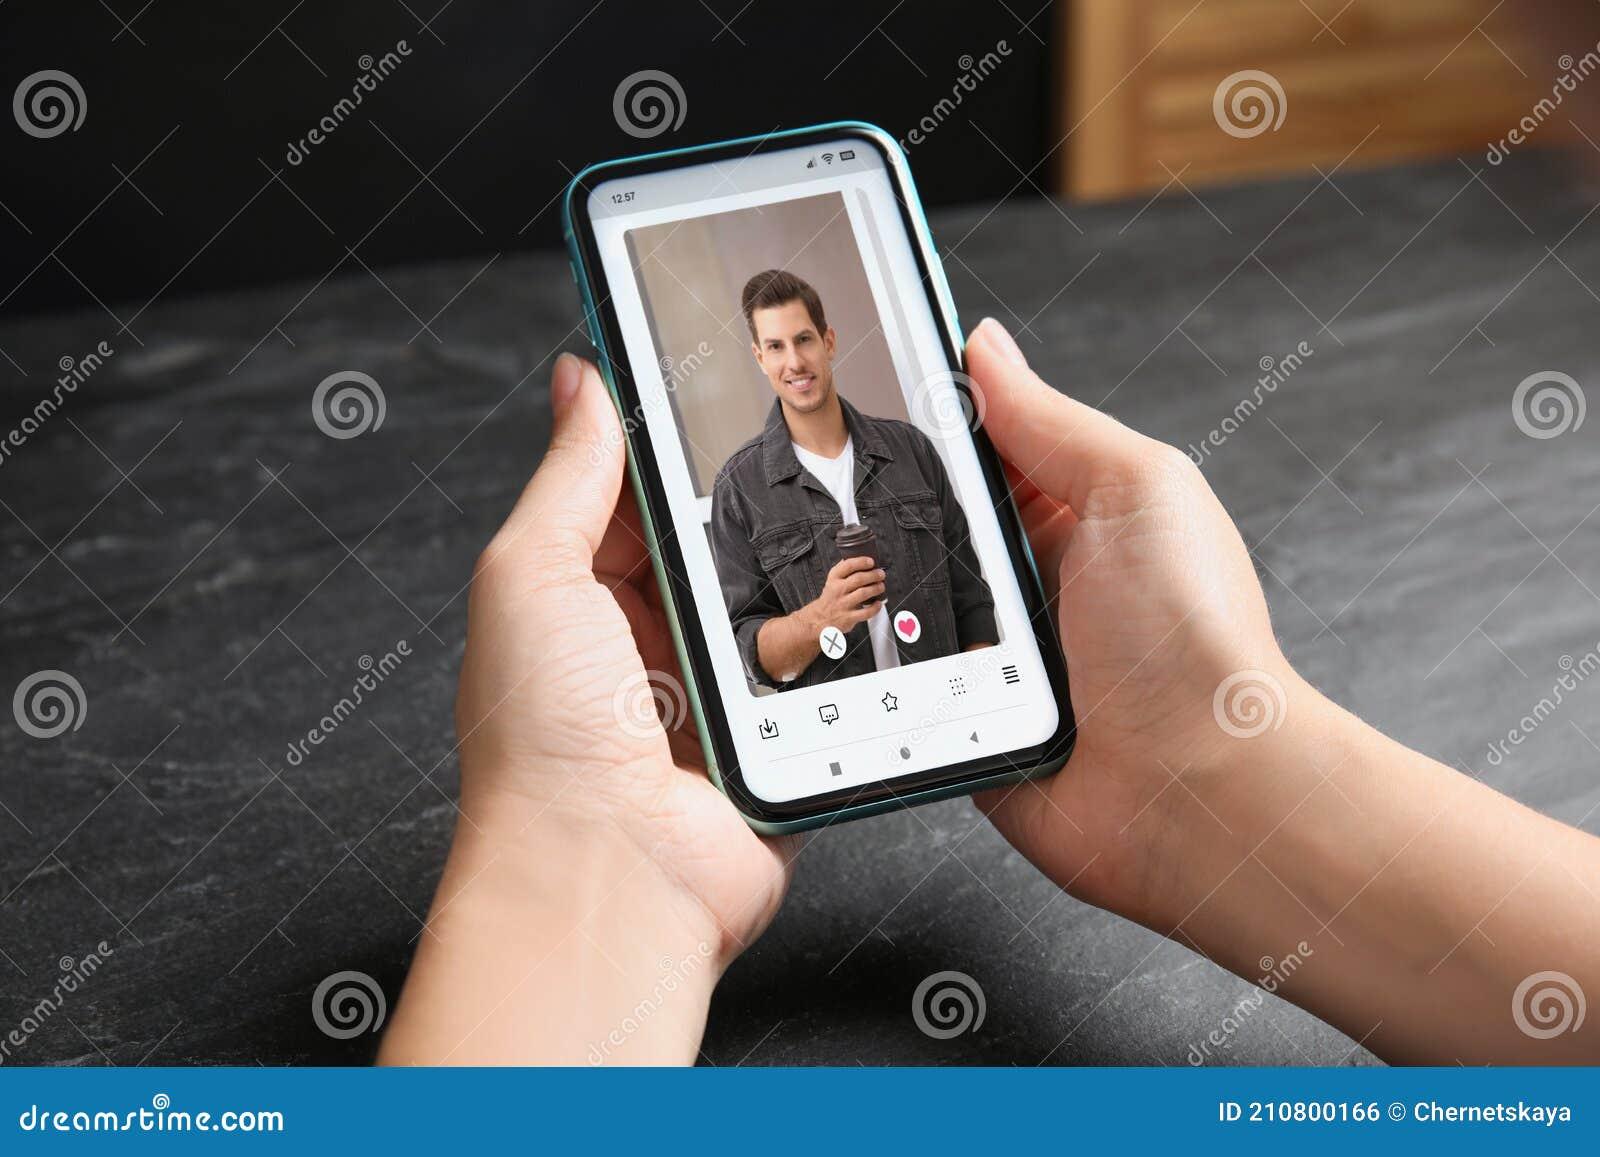 Dating Site 57 bun site de dating bun mesaj